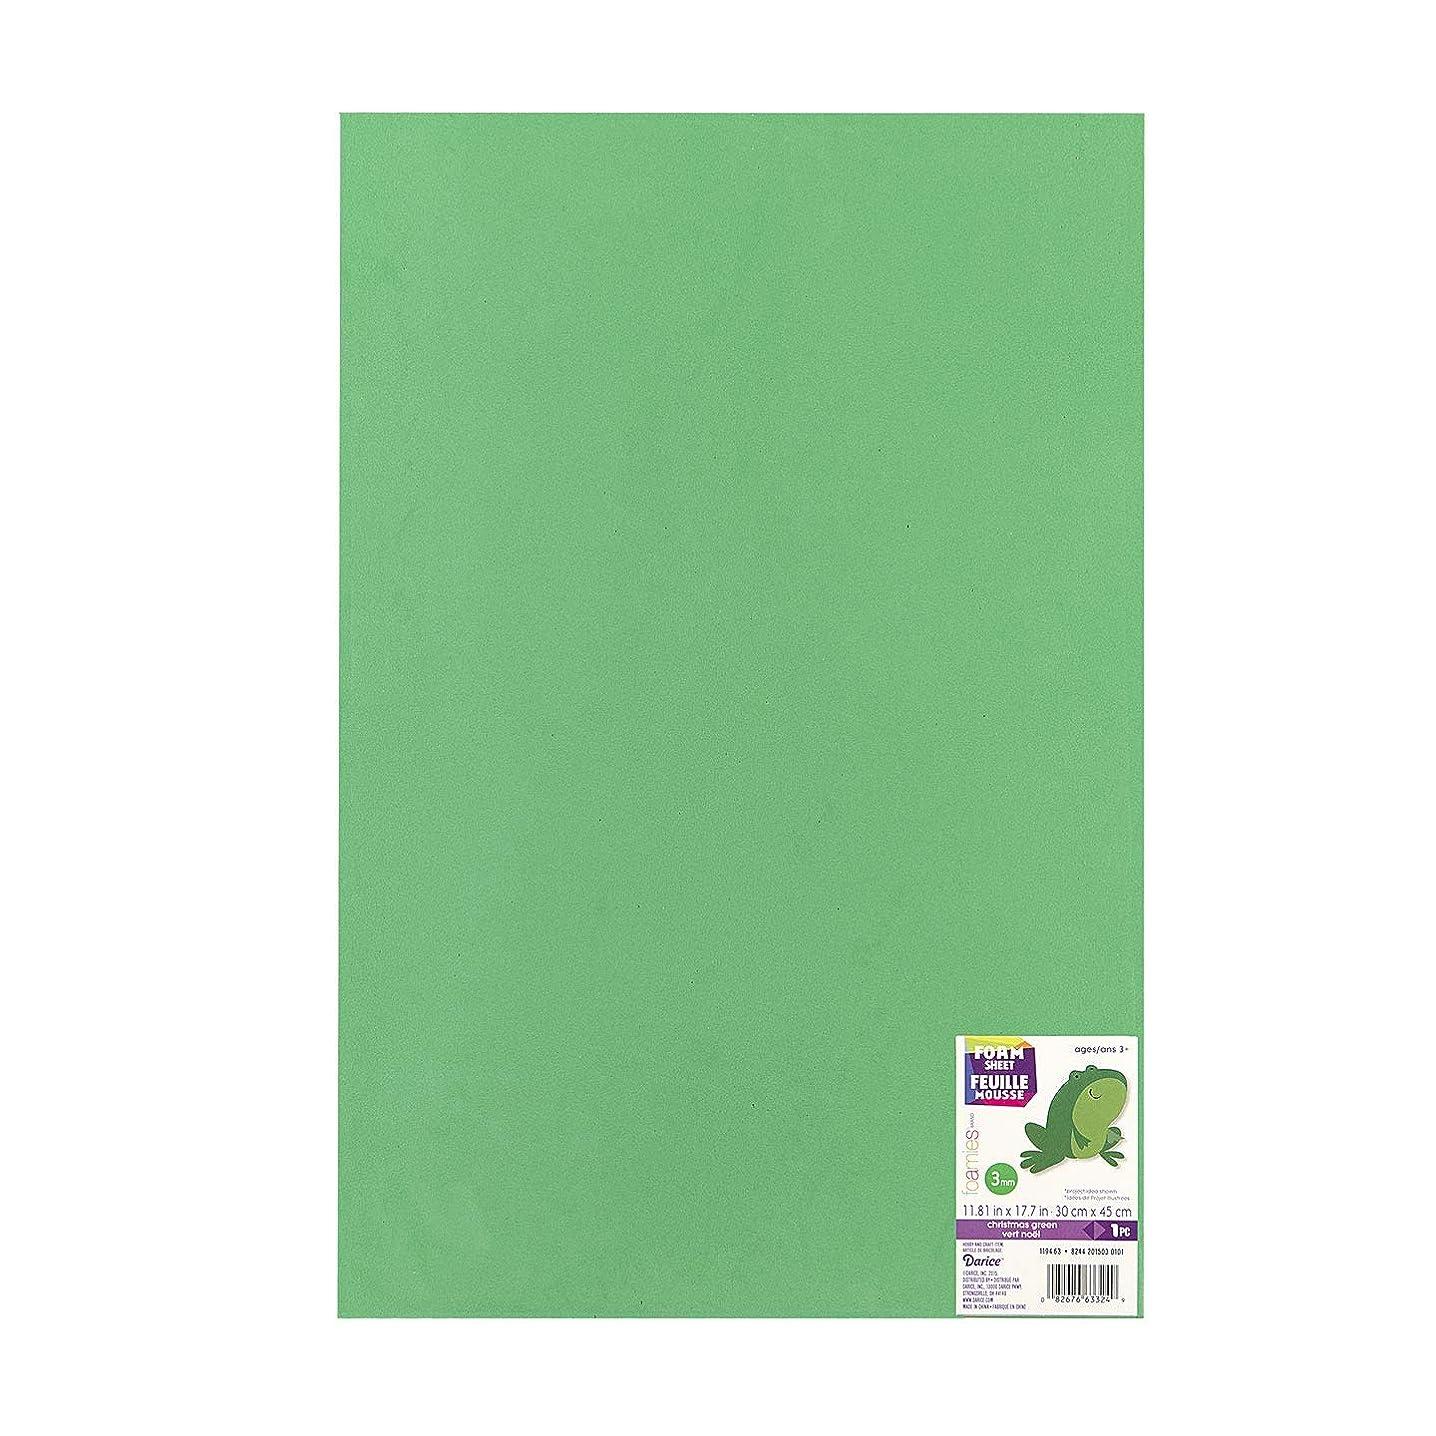 Bulk Buy: Darice Foamies Foam Sheet Christmas Green 3mm thick 12 x 18 inches (10-Pack) 1194-63